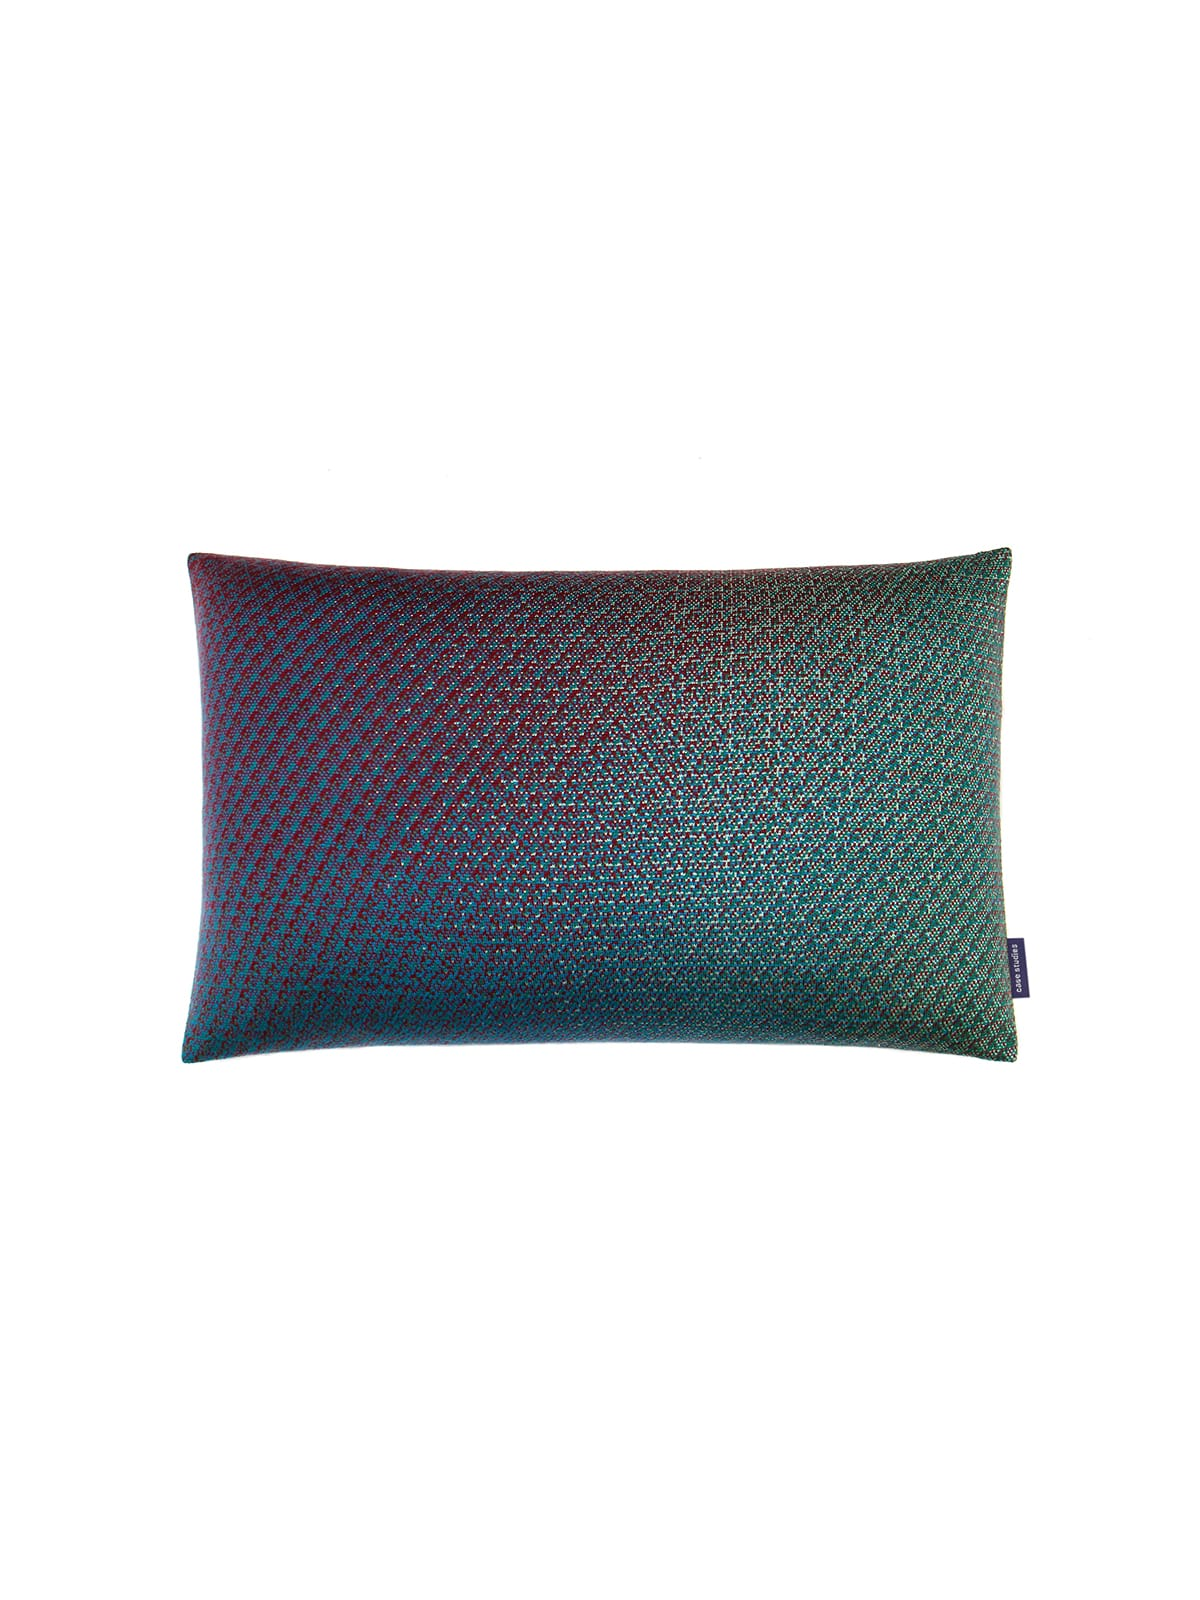 Knitted Cushion 40x60 Venice - Merino Wool